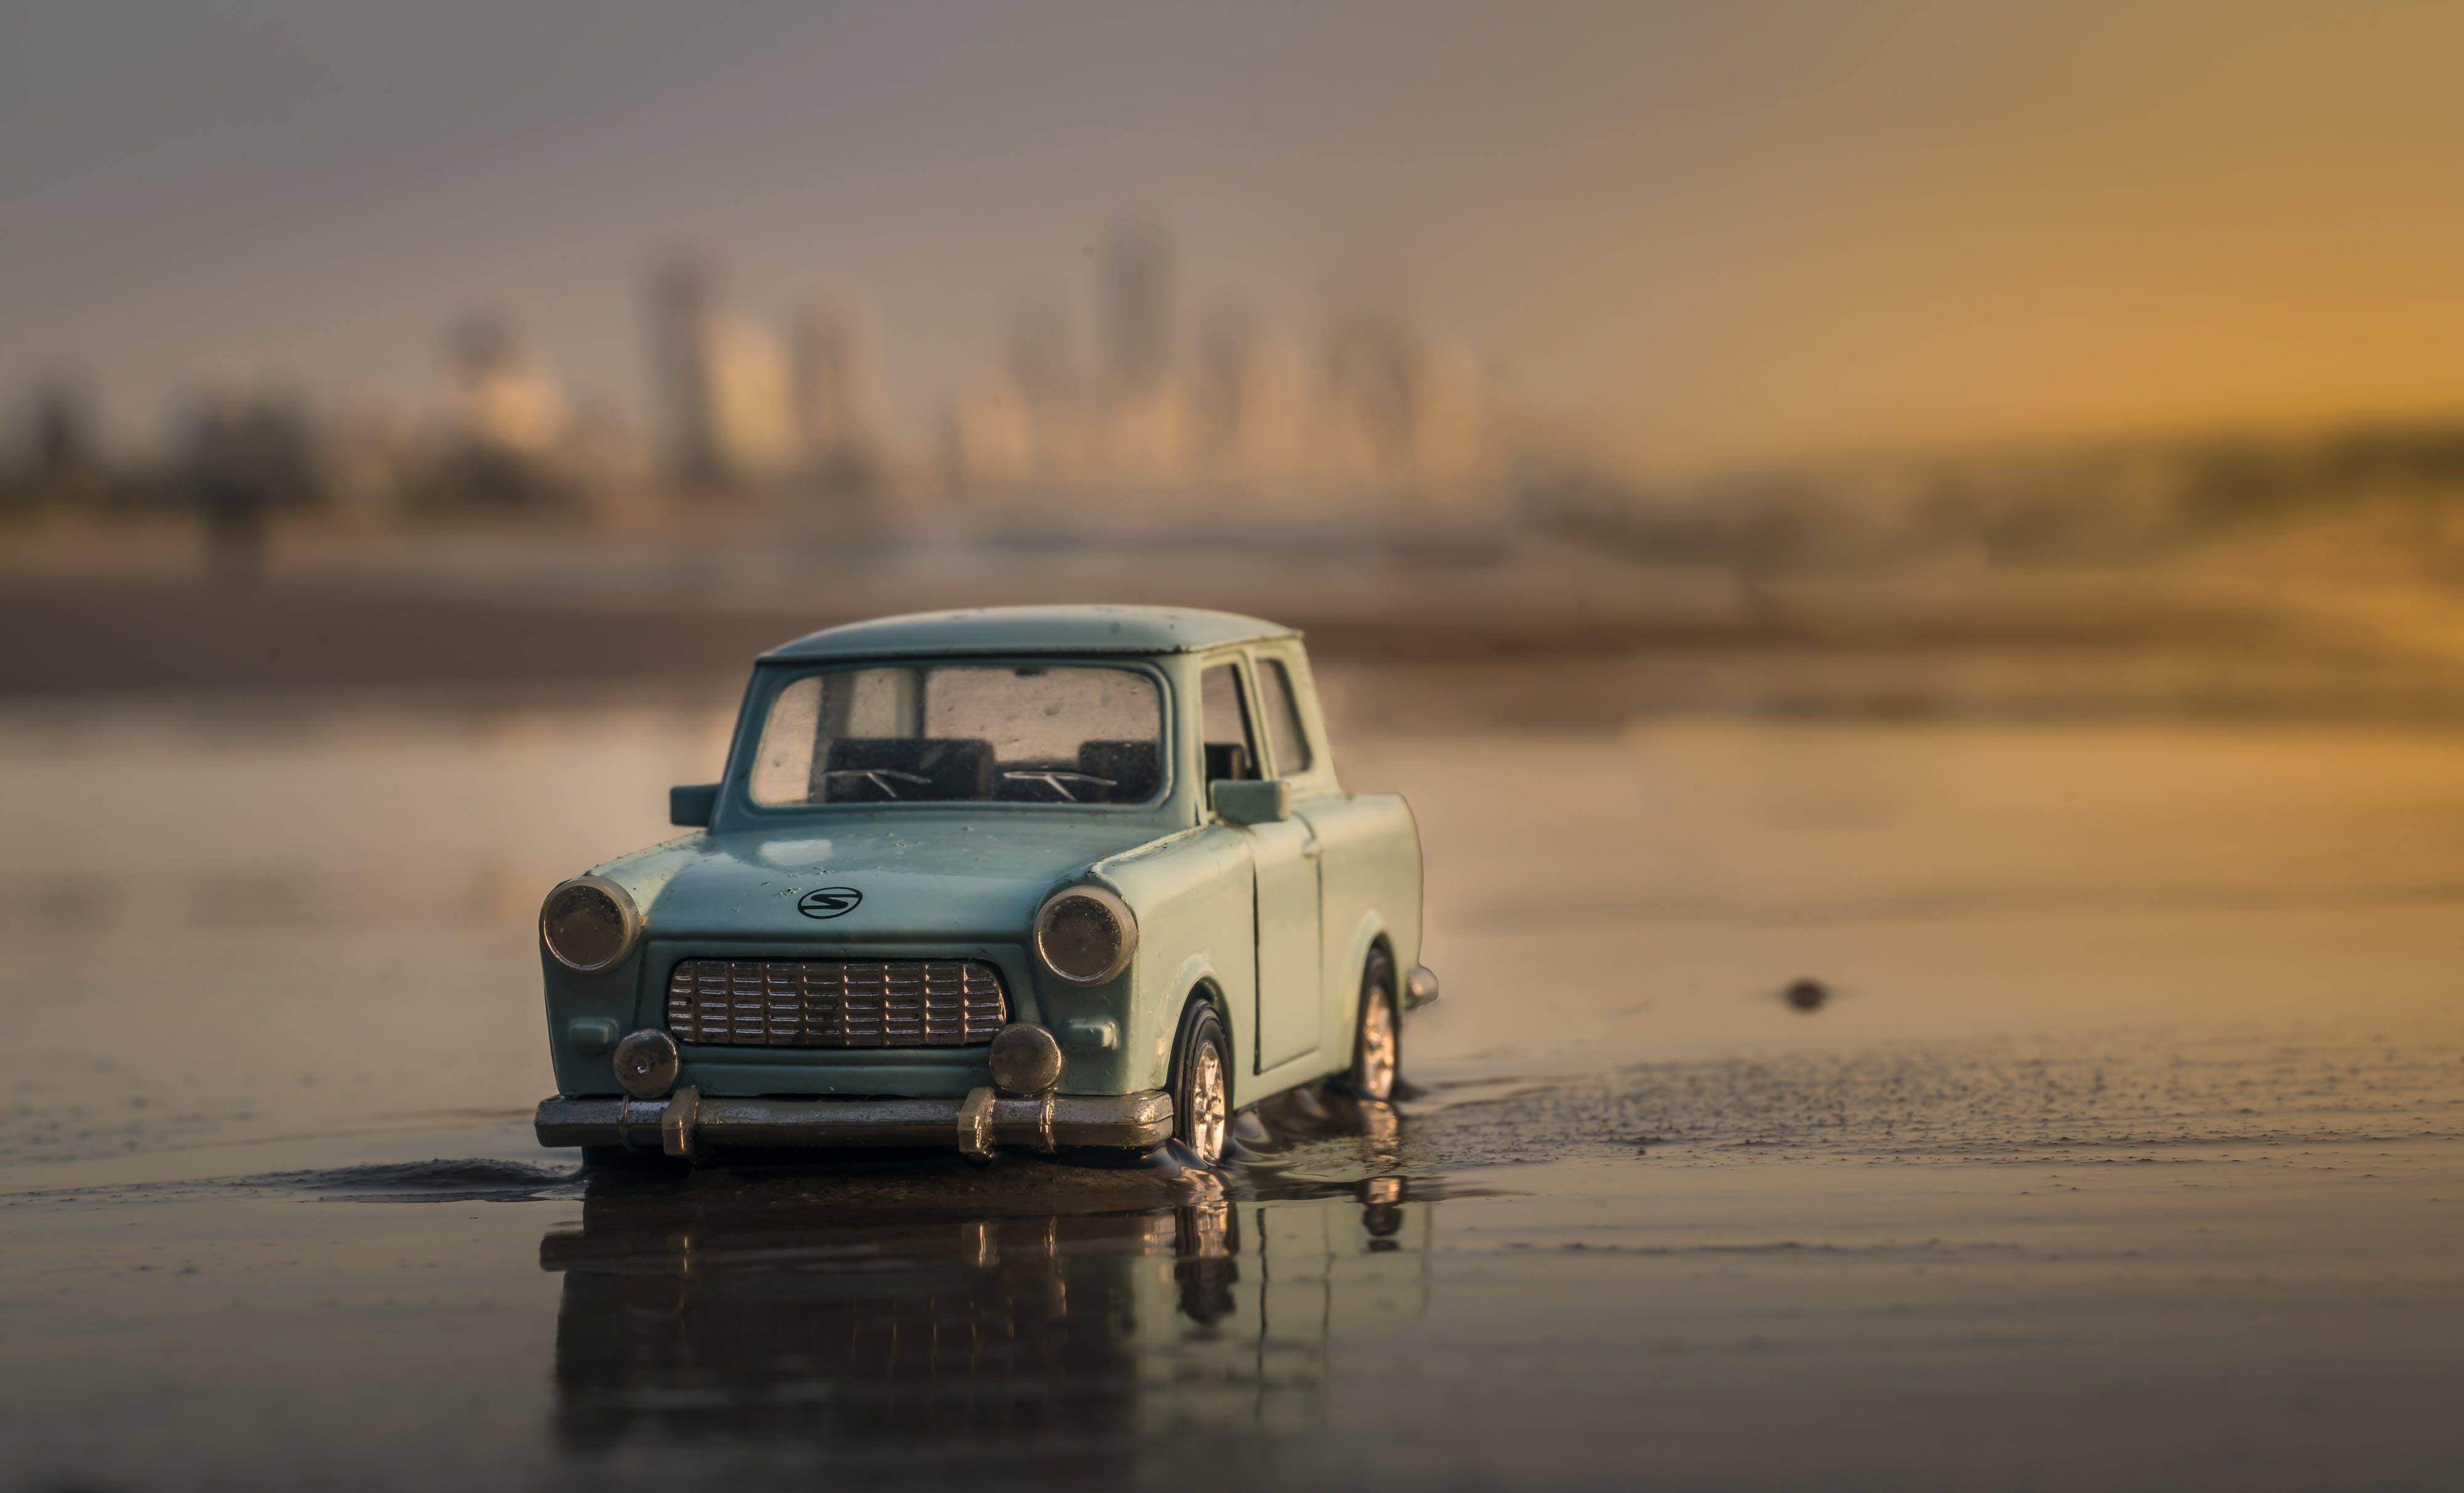 Free stock photo of beach, sand, water, model